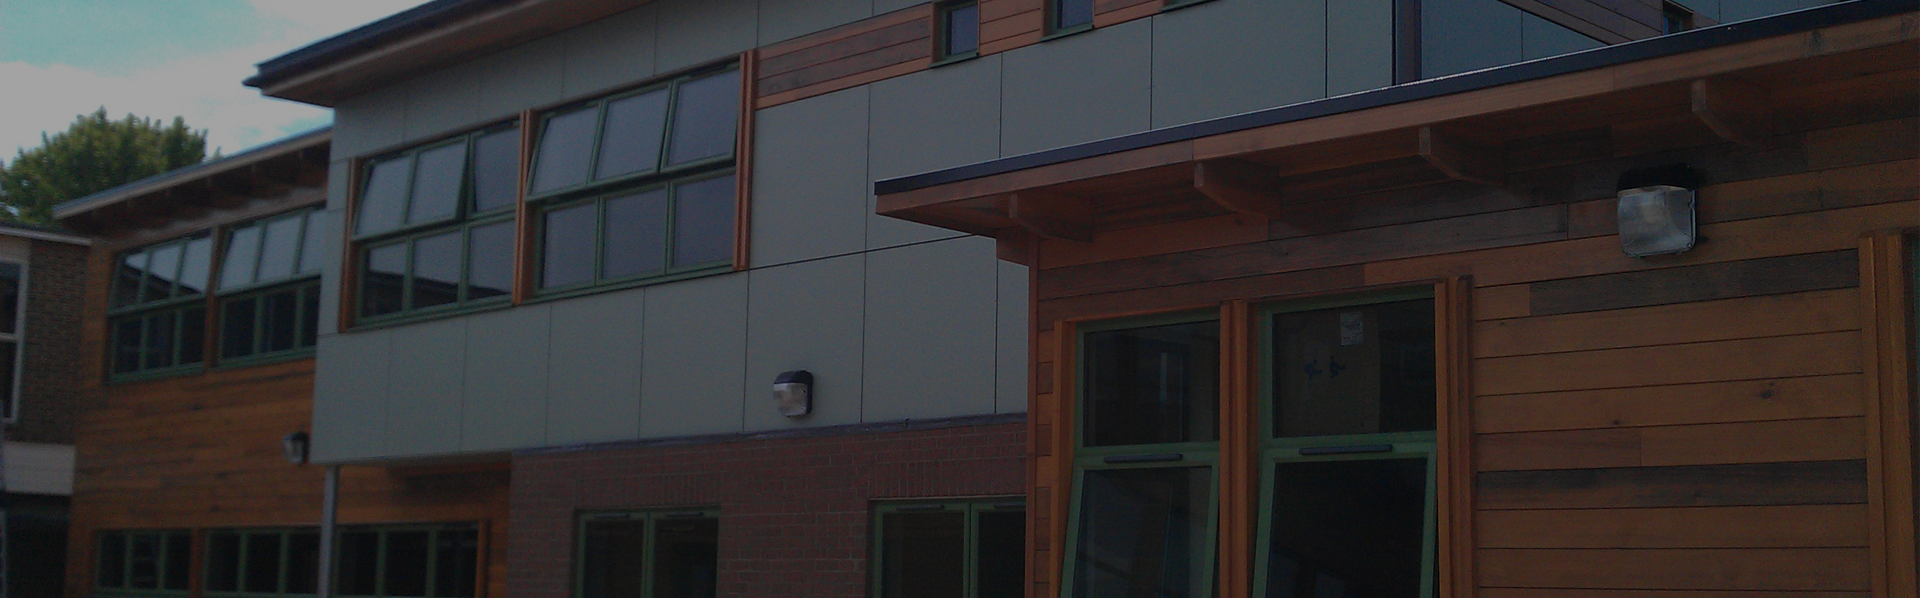 New Build Carpentry Contractor Midlands